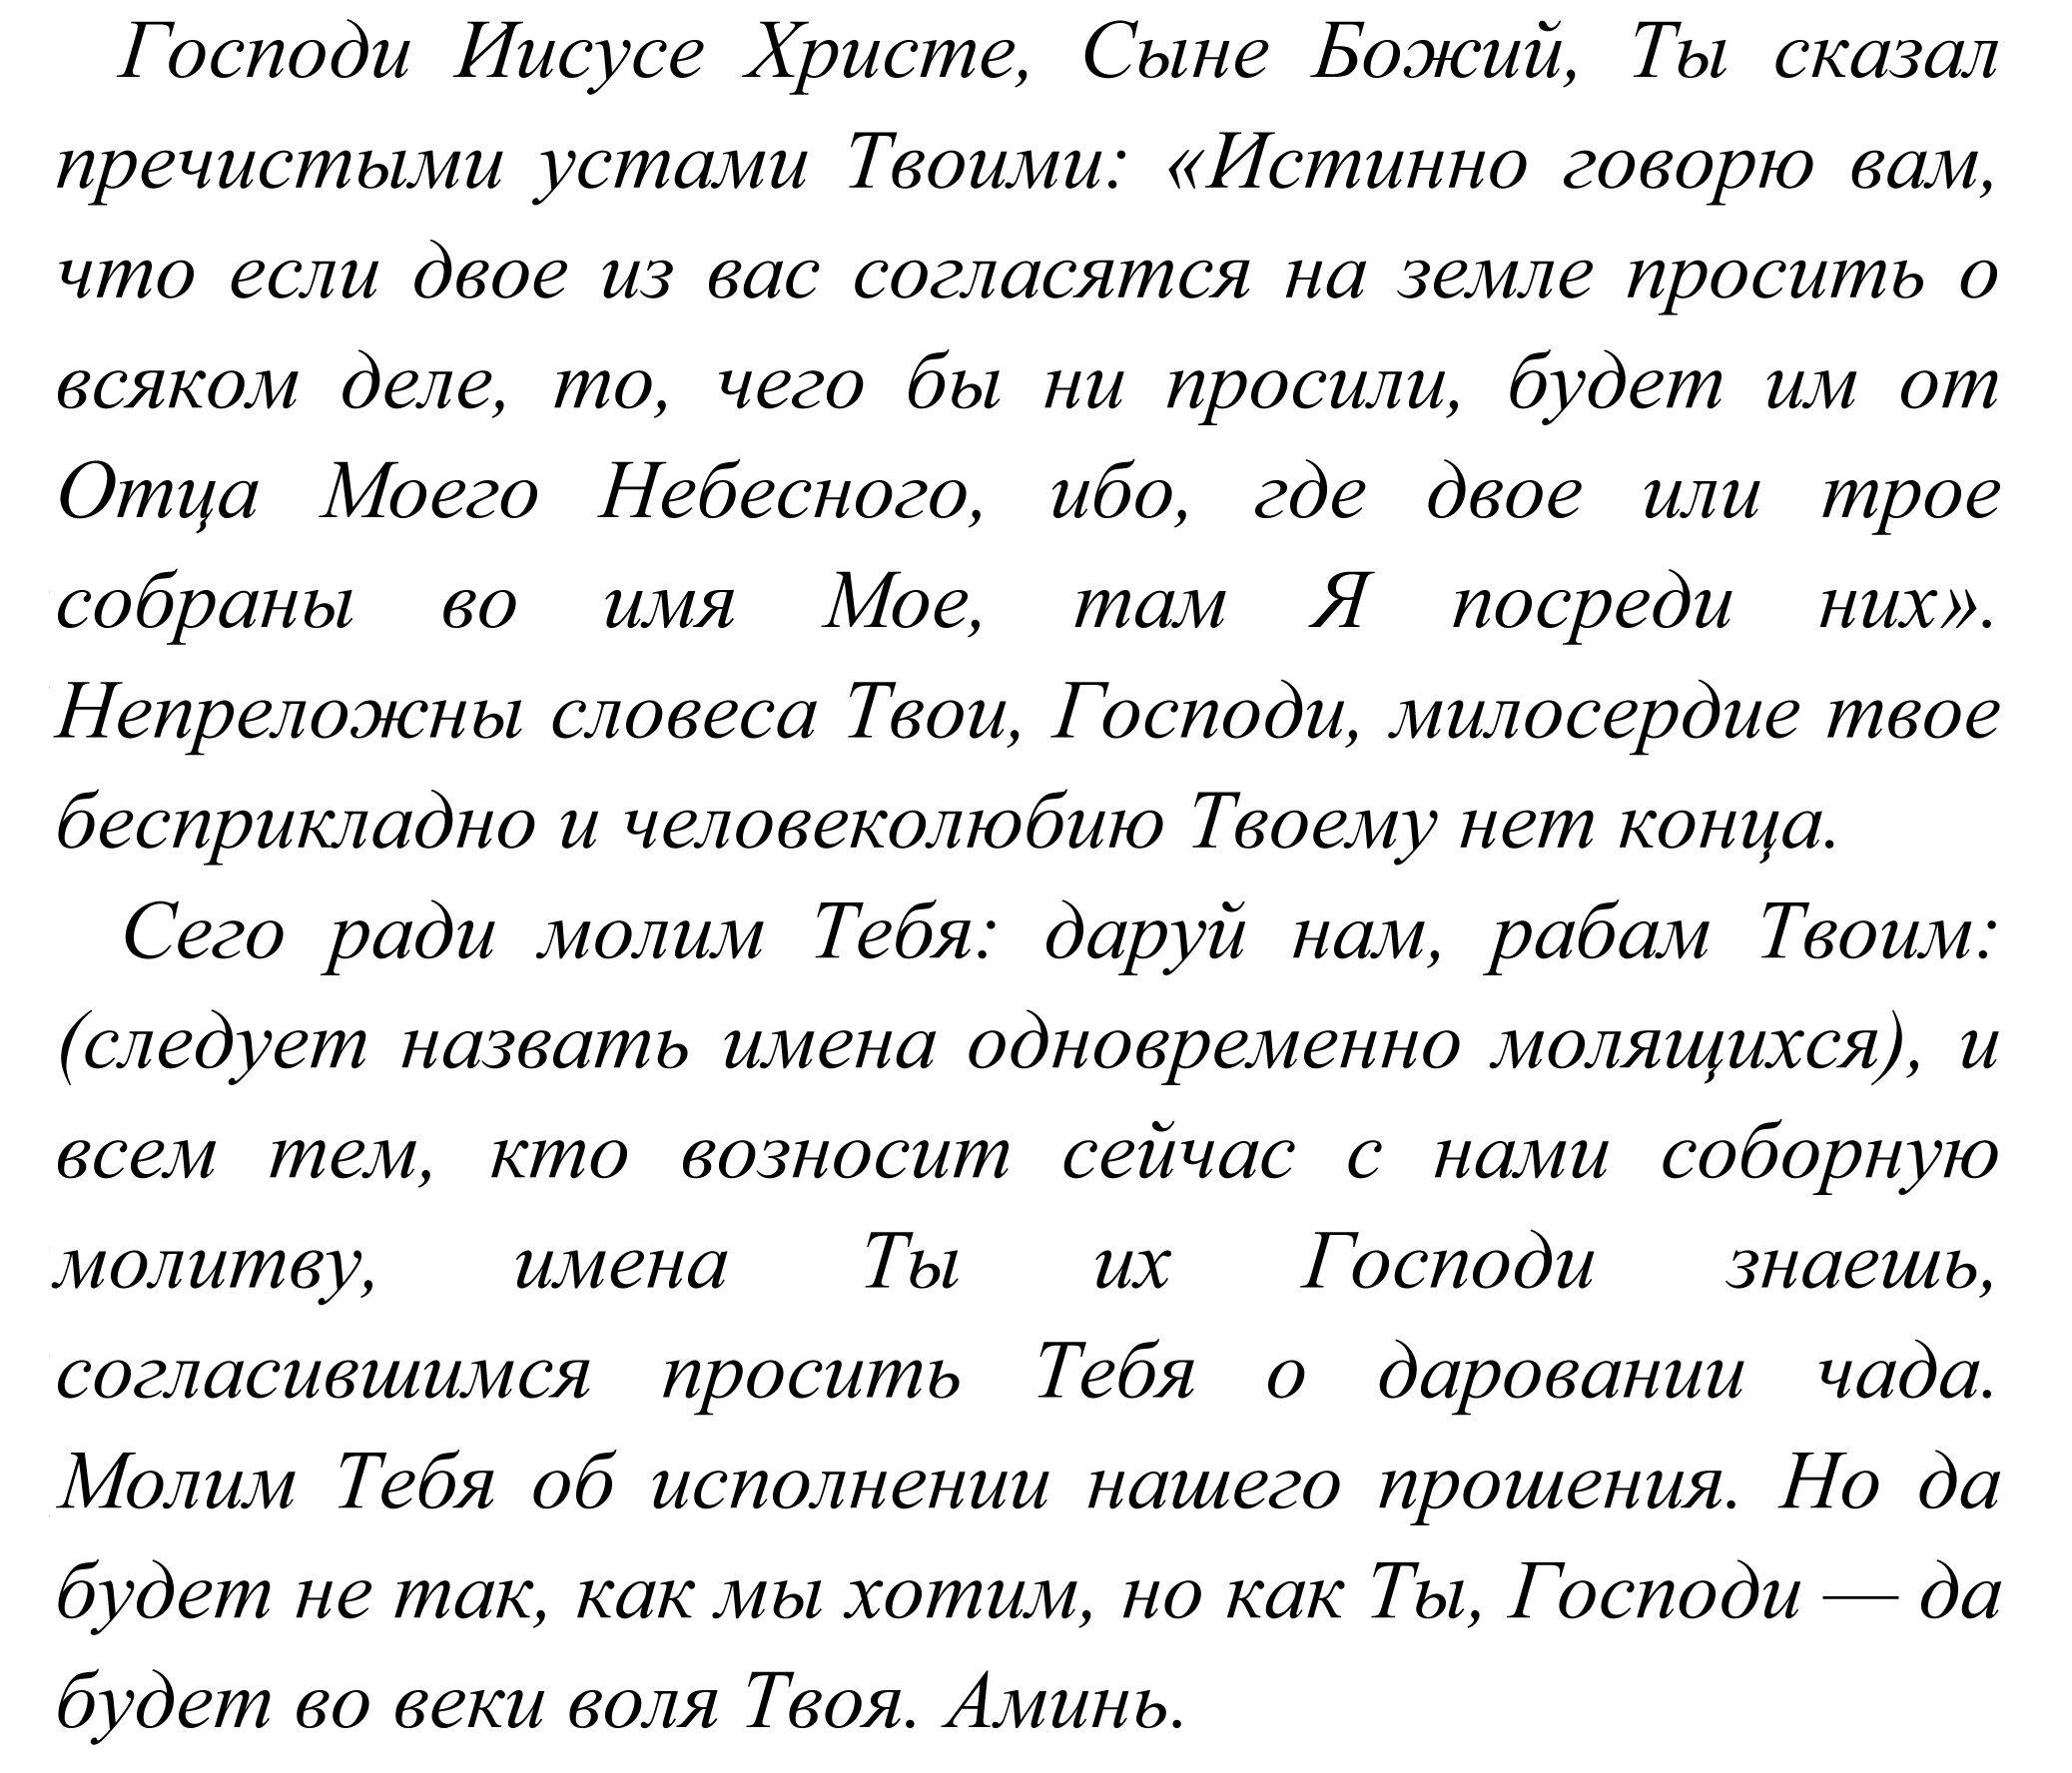 Odetyach